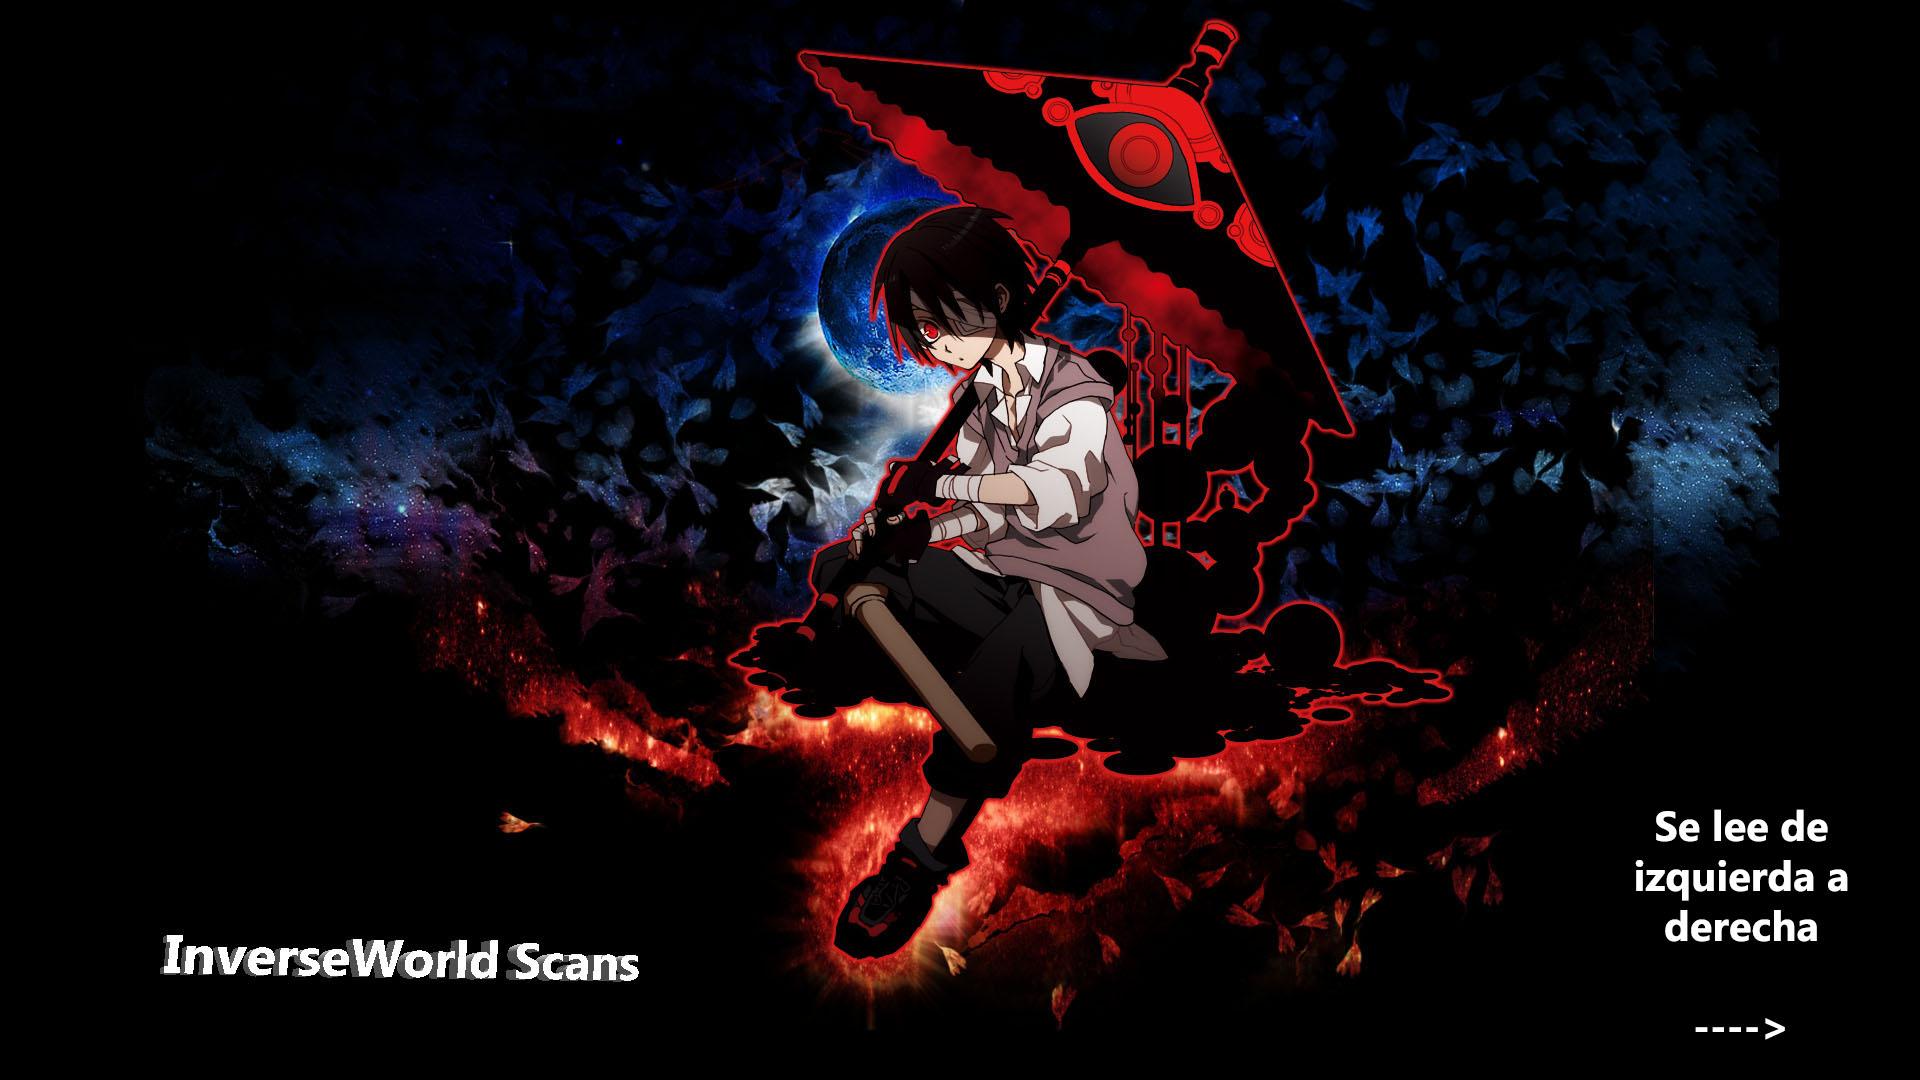 http://c5.ninemanga.com/es_manga/26/16346/405273/e154da6b5da15e7285e8fb588c361eb2.jpg Page 2